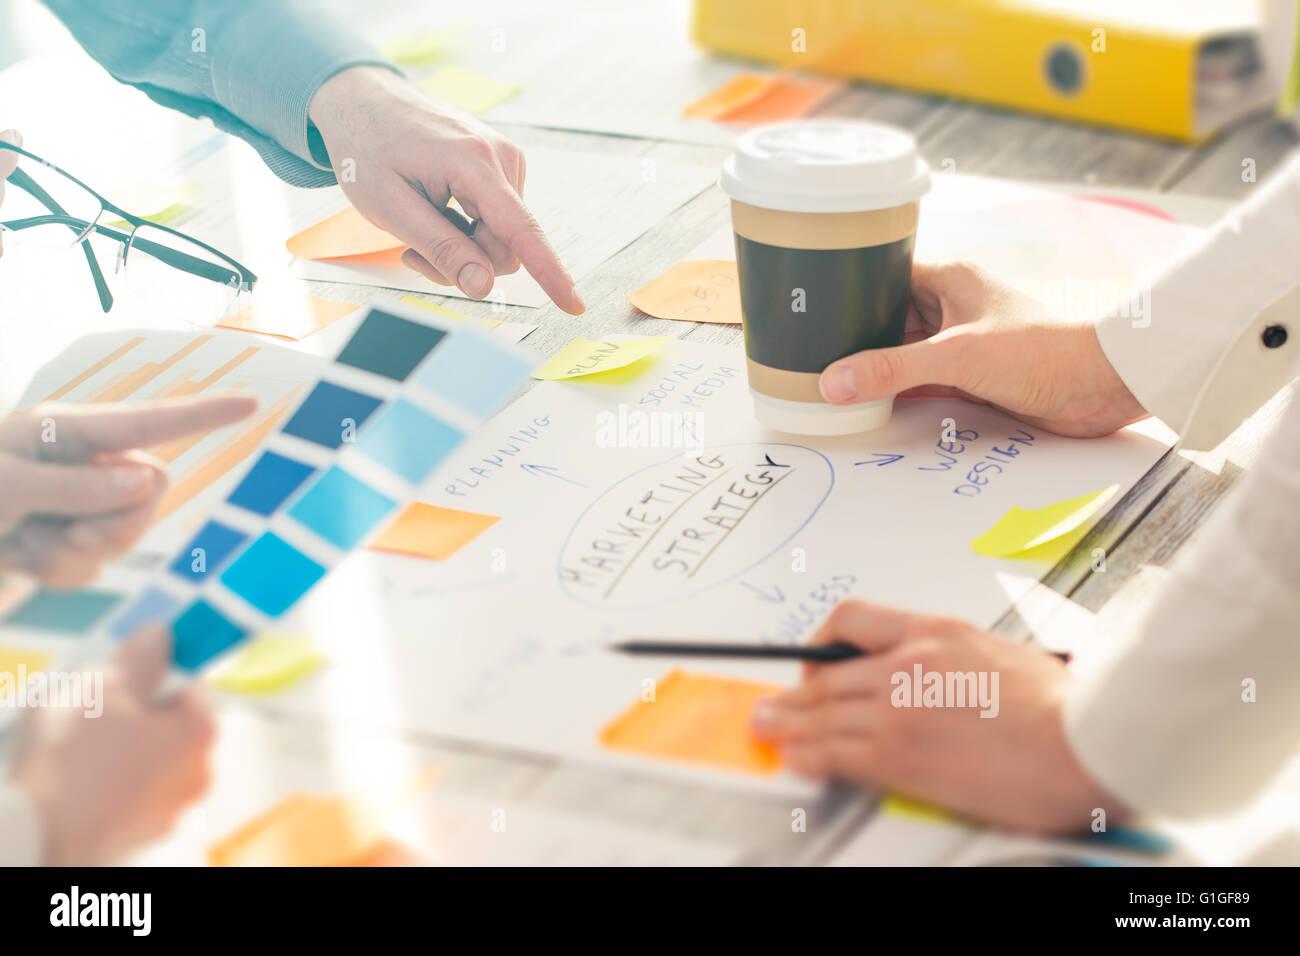 Brainstorming Brainstorm Business People Design Planning - Stock Image